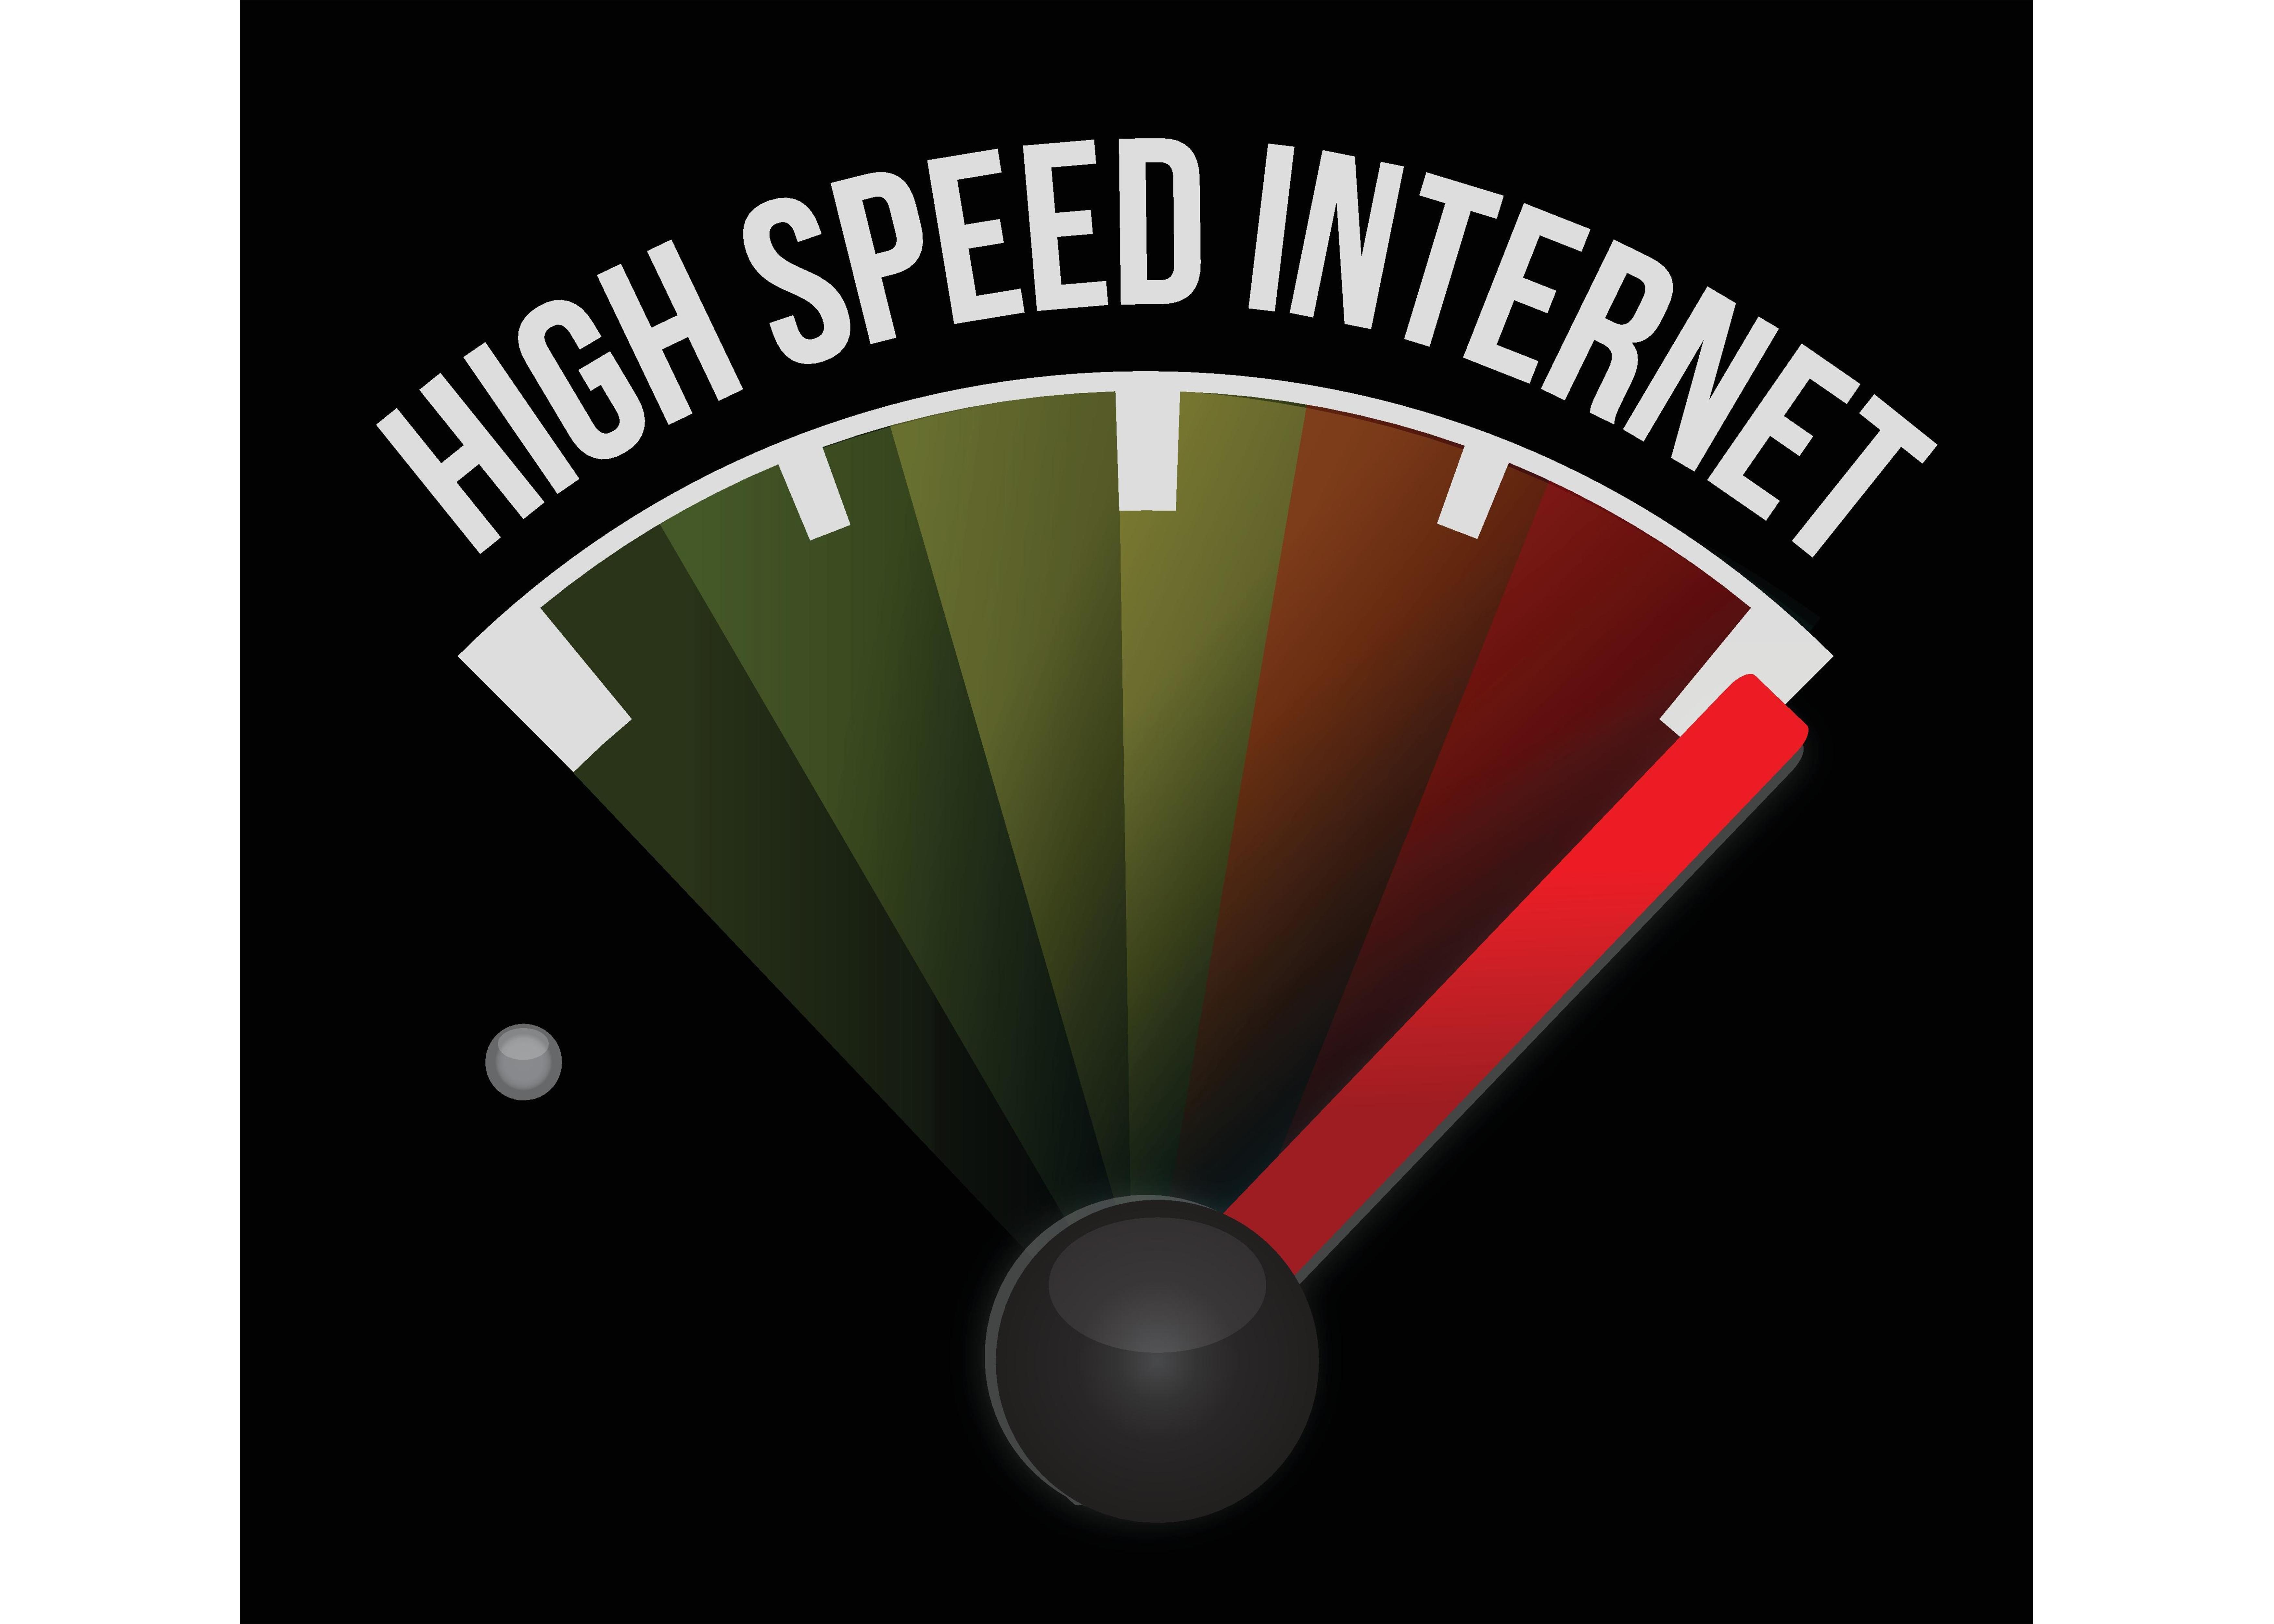 Fastest Internet Service Provider